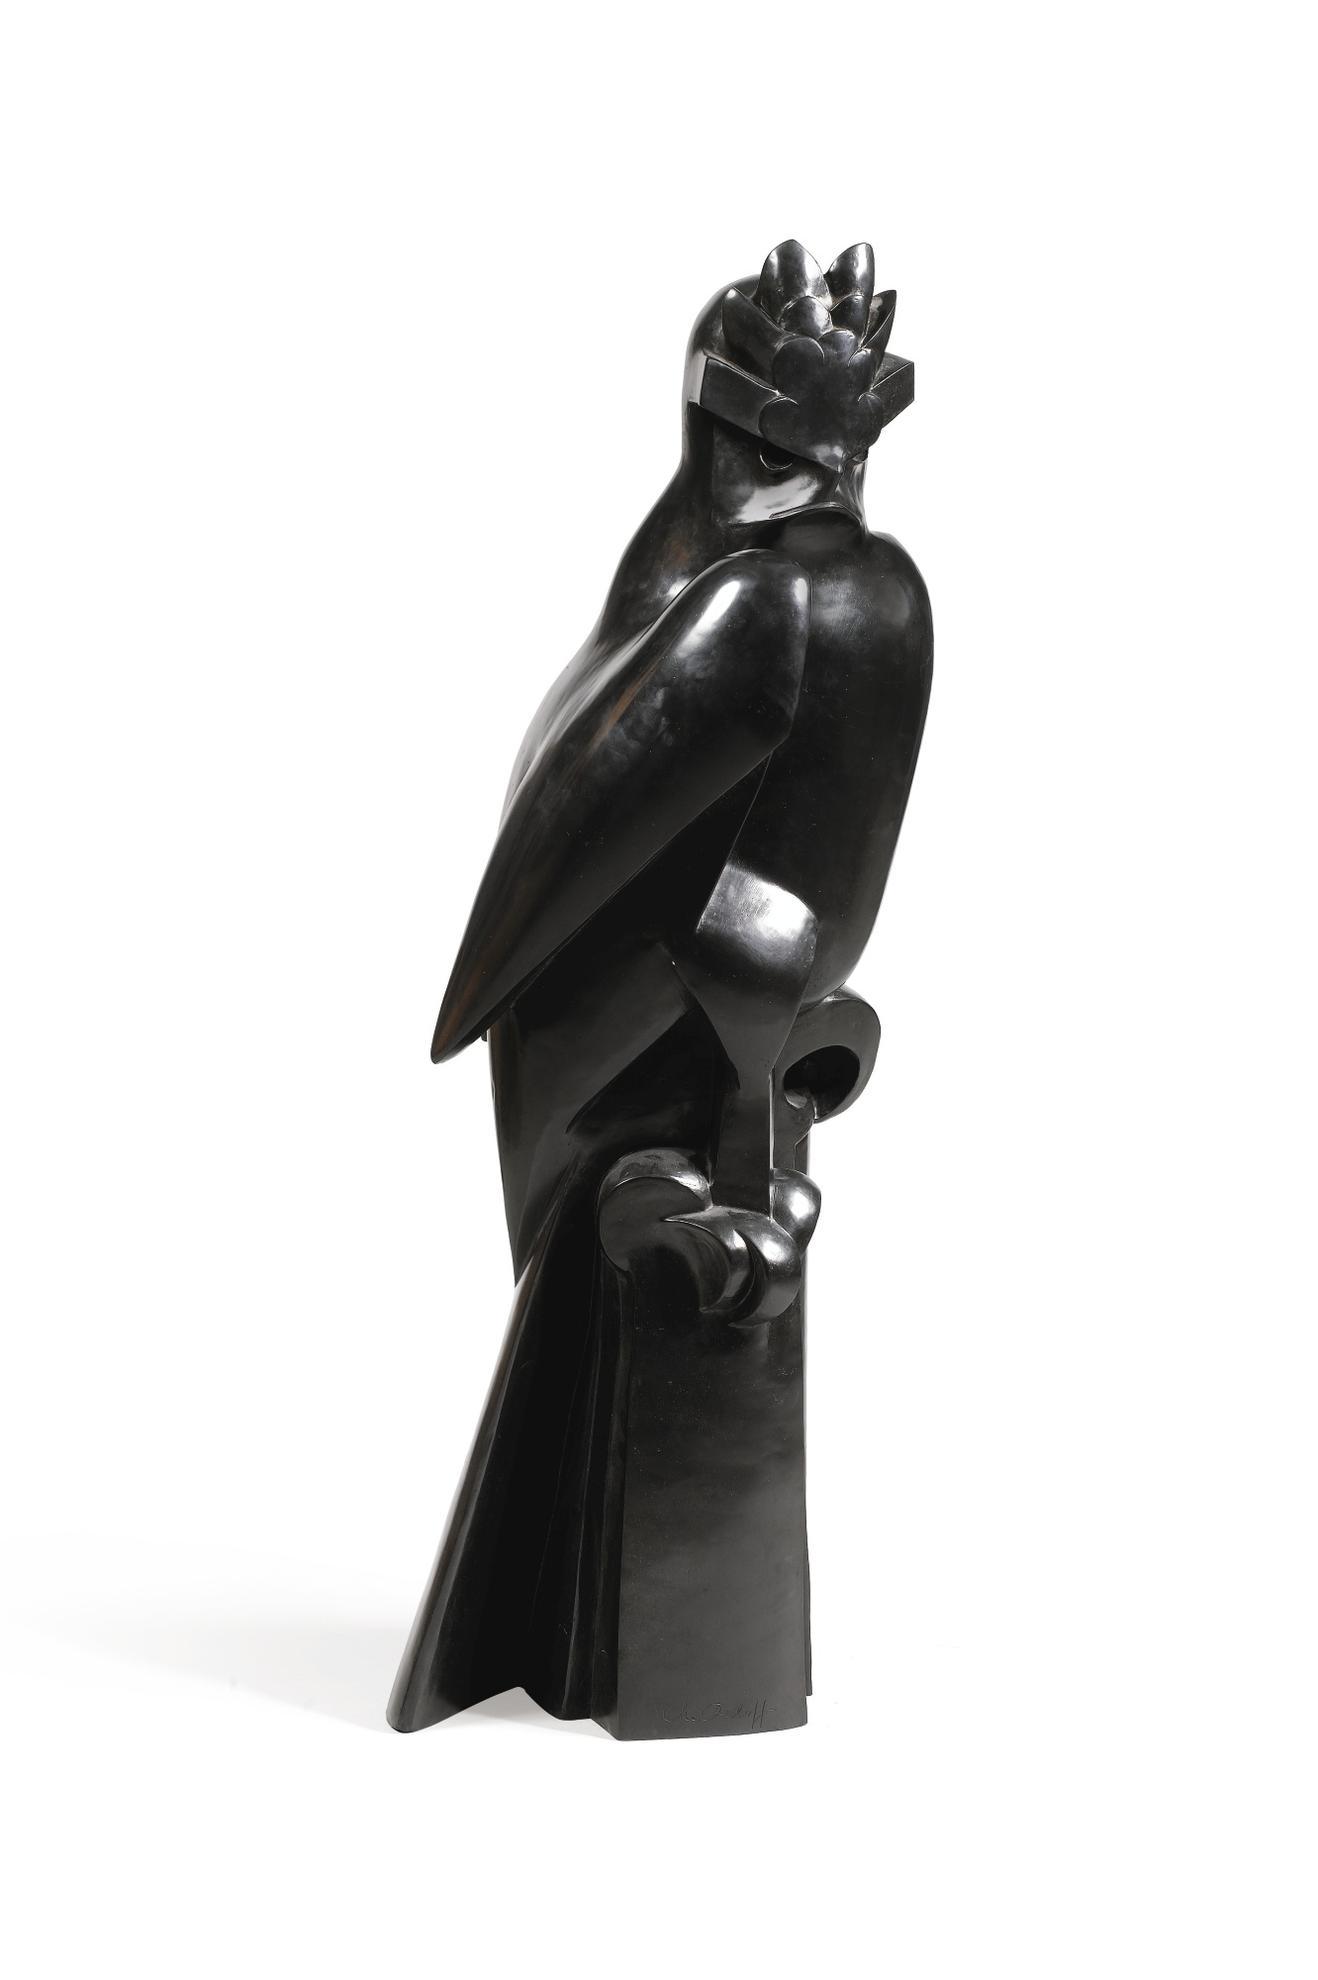 Chana Orloff-Oiseau 14-18-1924